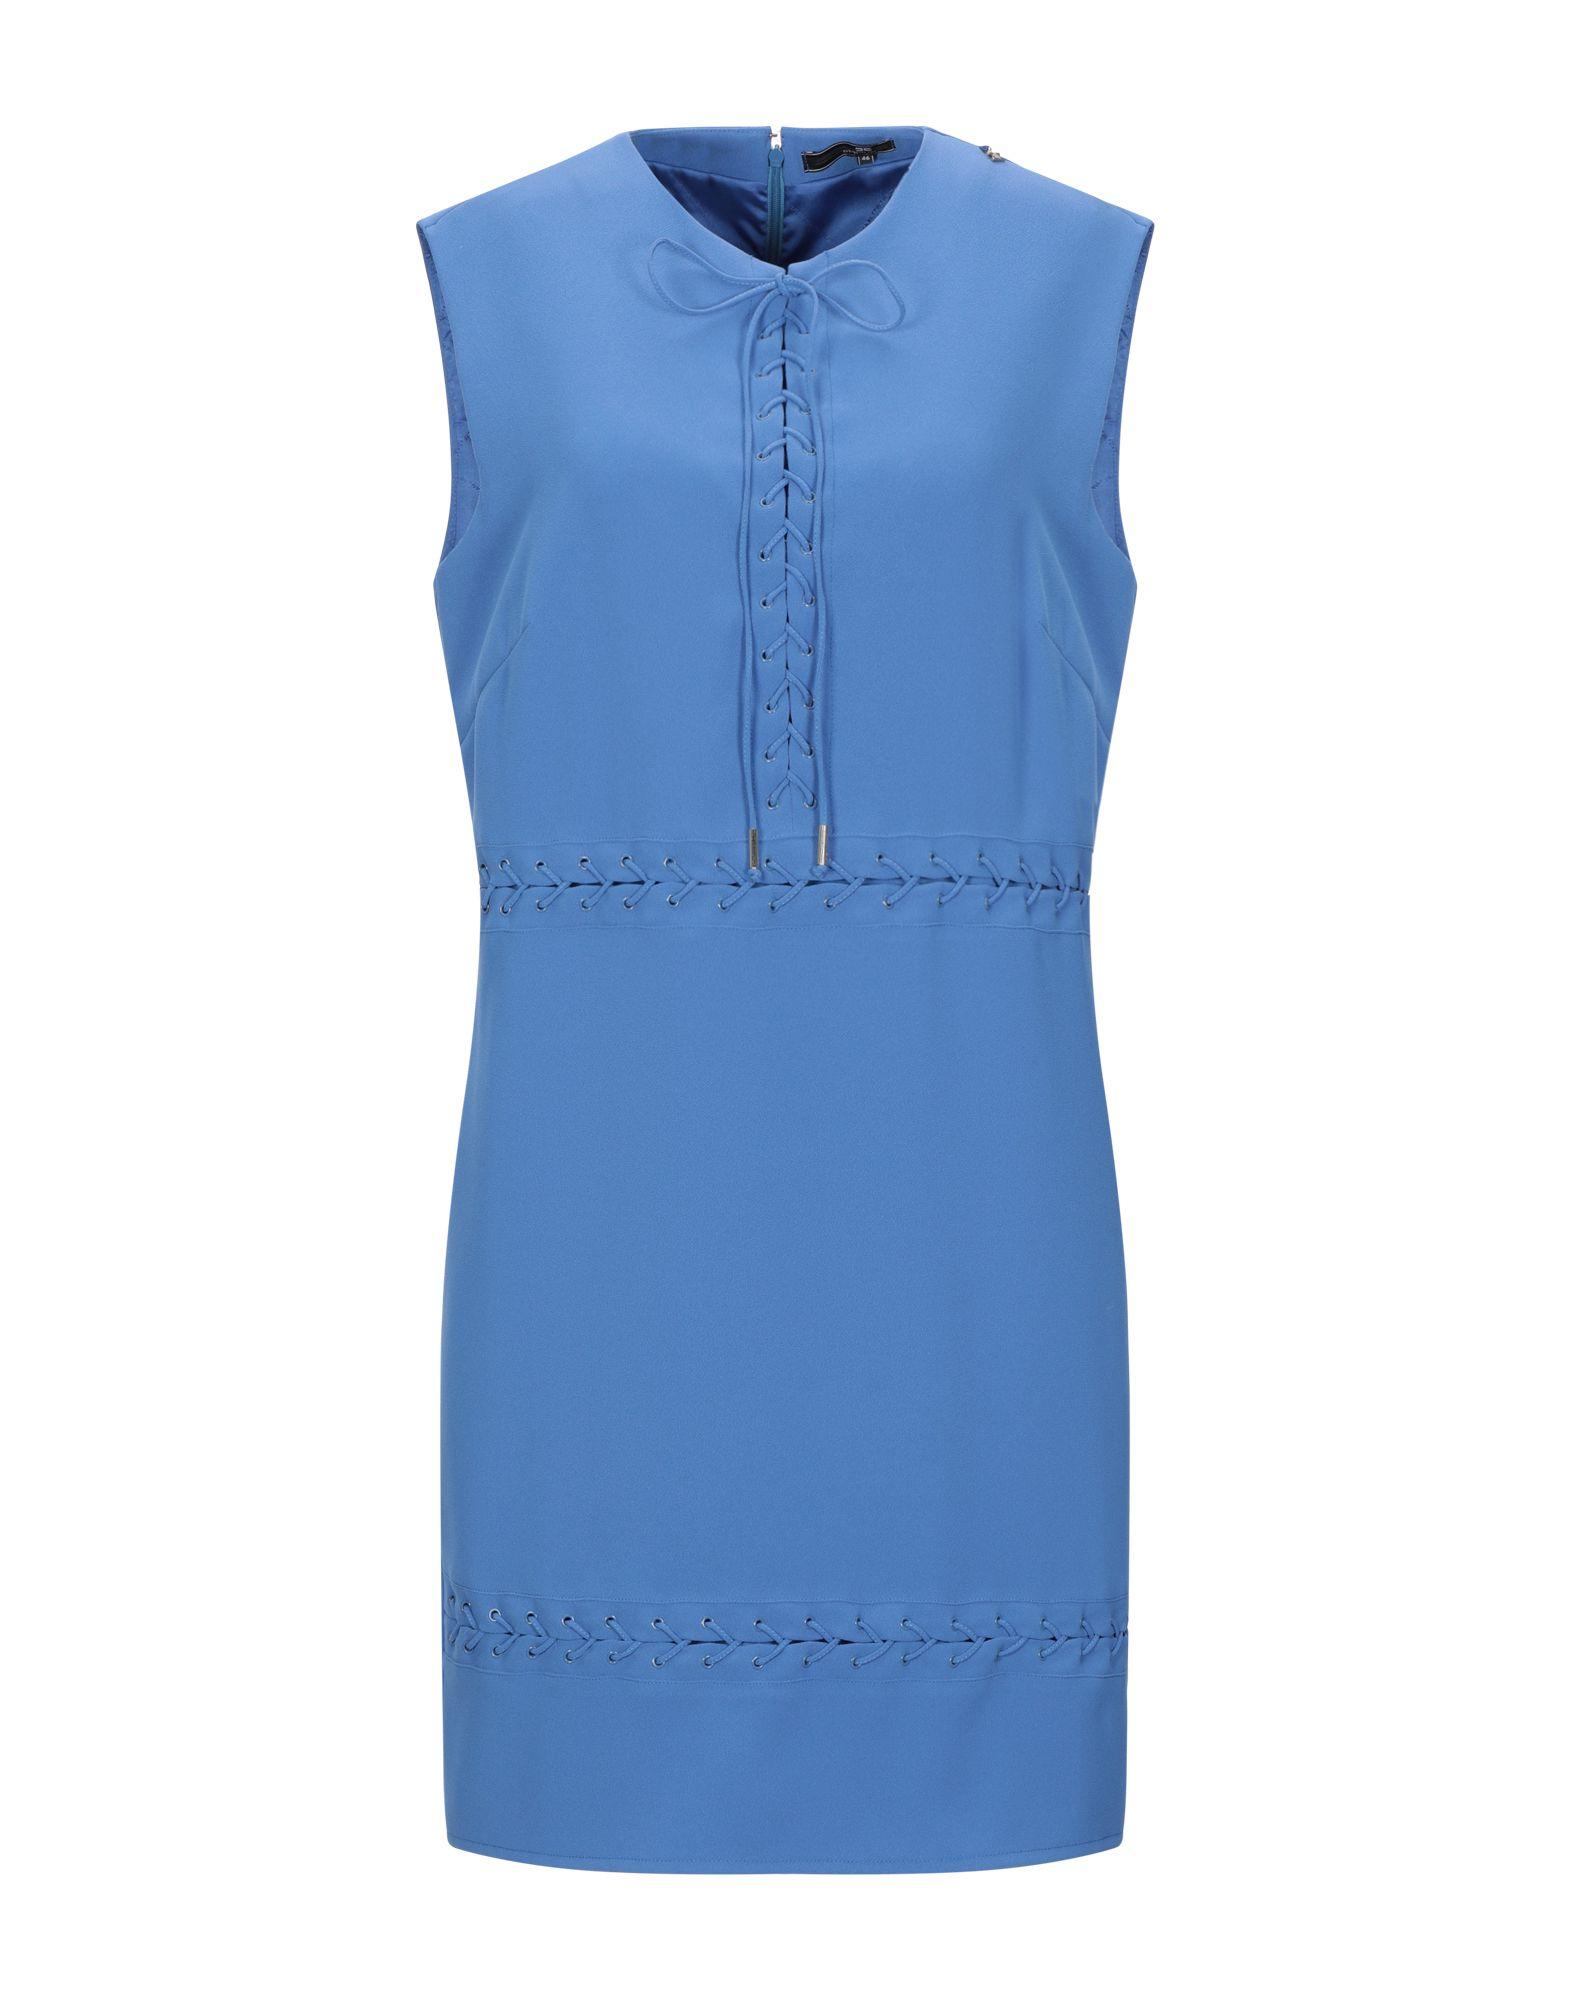 ELISABETTA FRANCHI 24 ORE Короткое платье elisabetta franchi 24 ore короткое платье